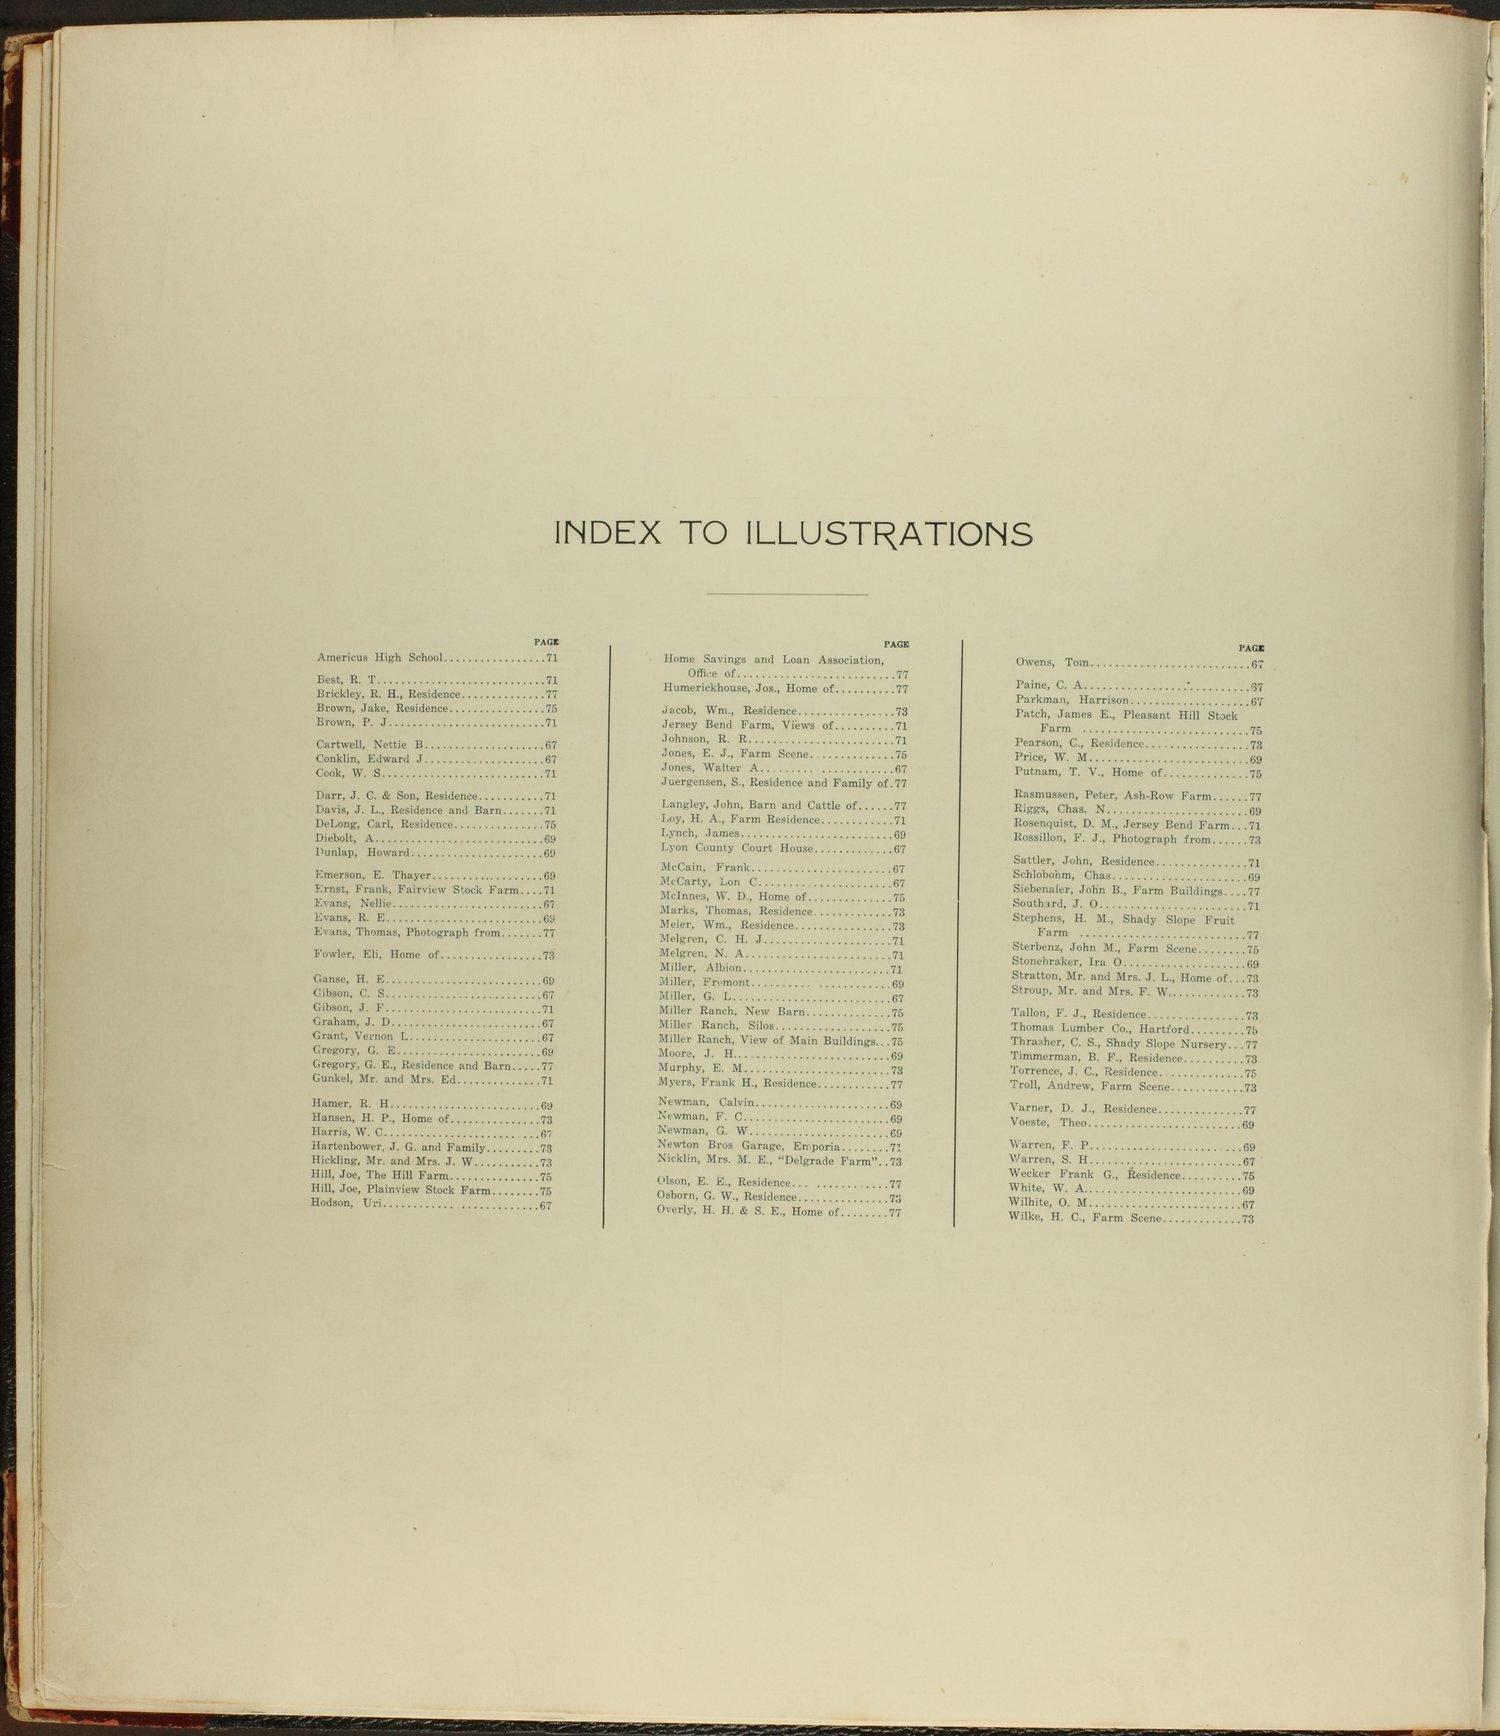 Standard atlas of Lyon County, Kansas - Index to Illustrations